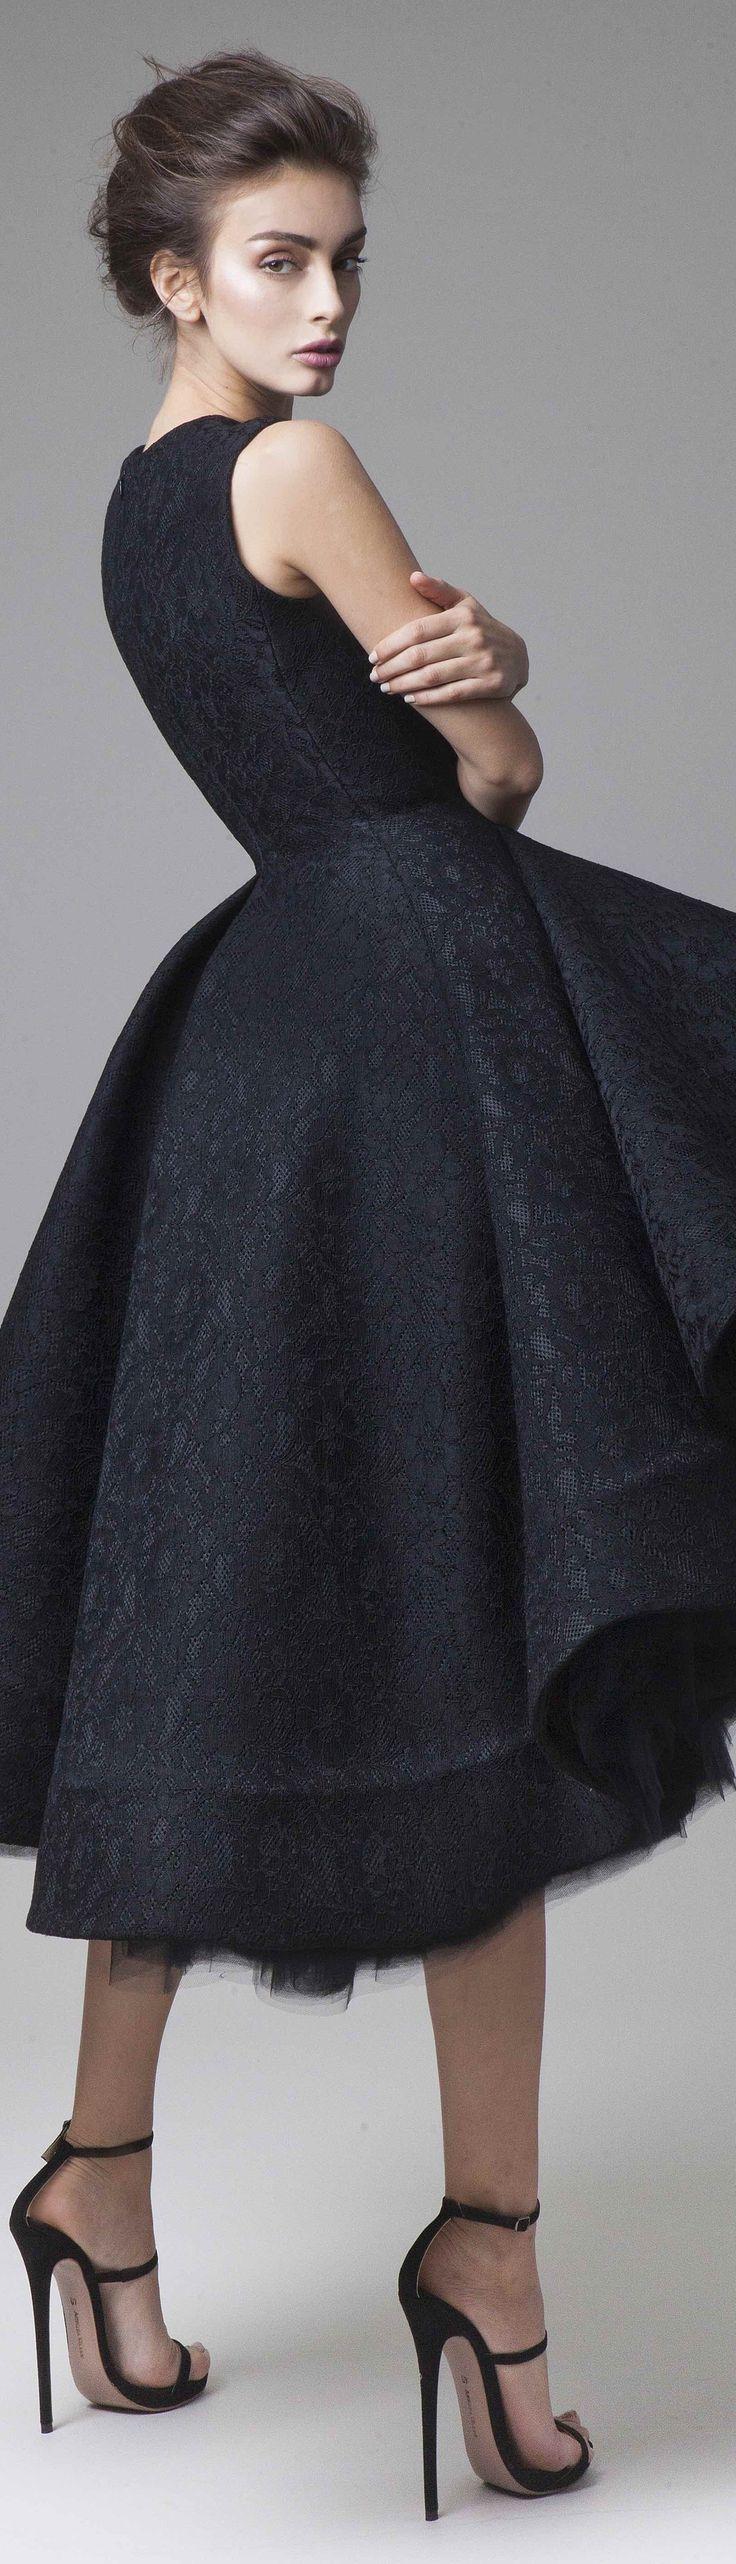 Krikor Jabotian couture